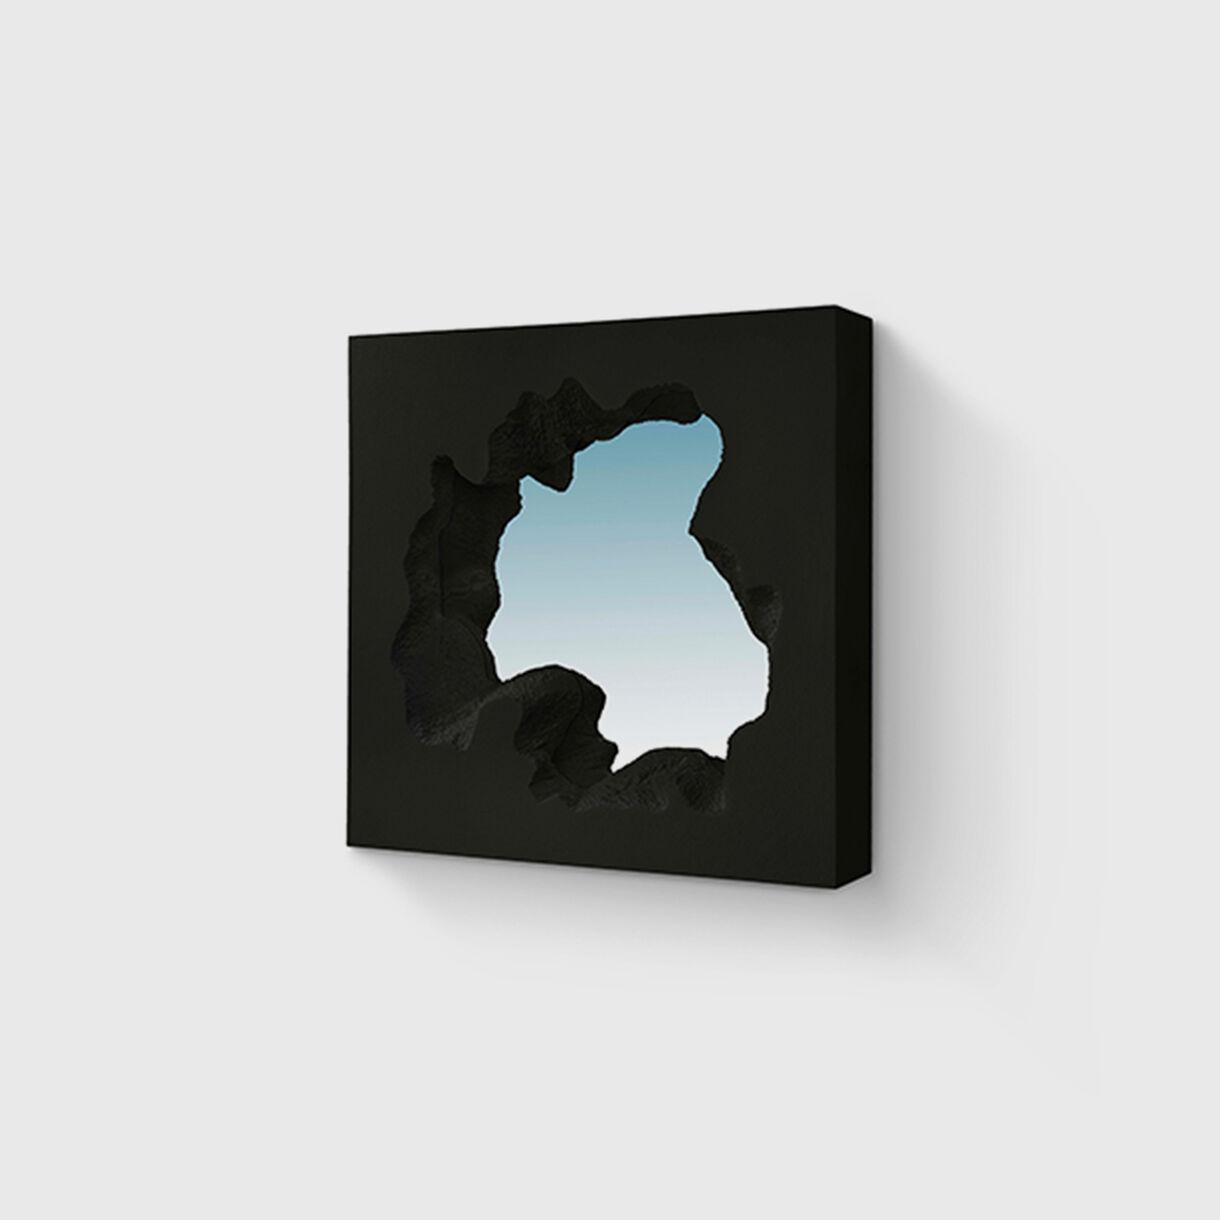 Broken Square Mirror, Black